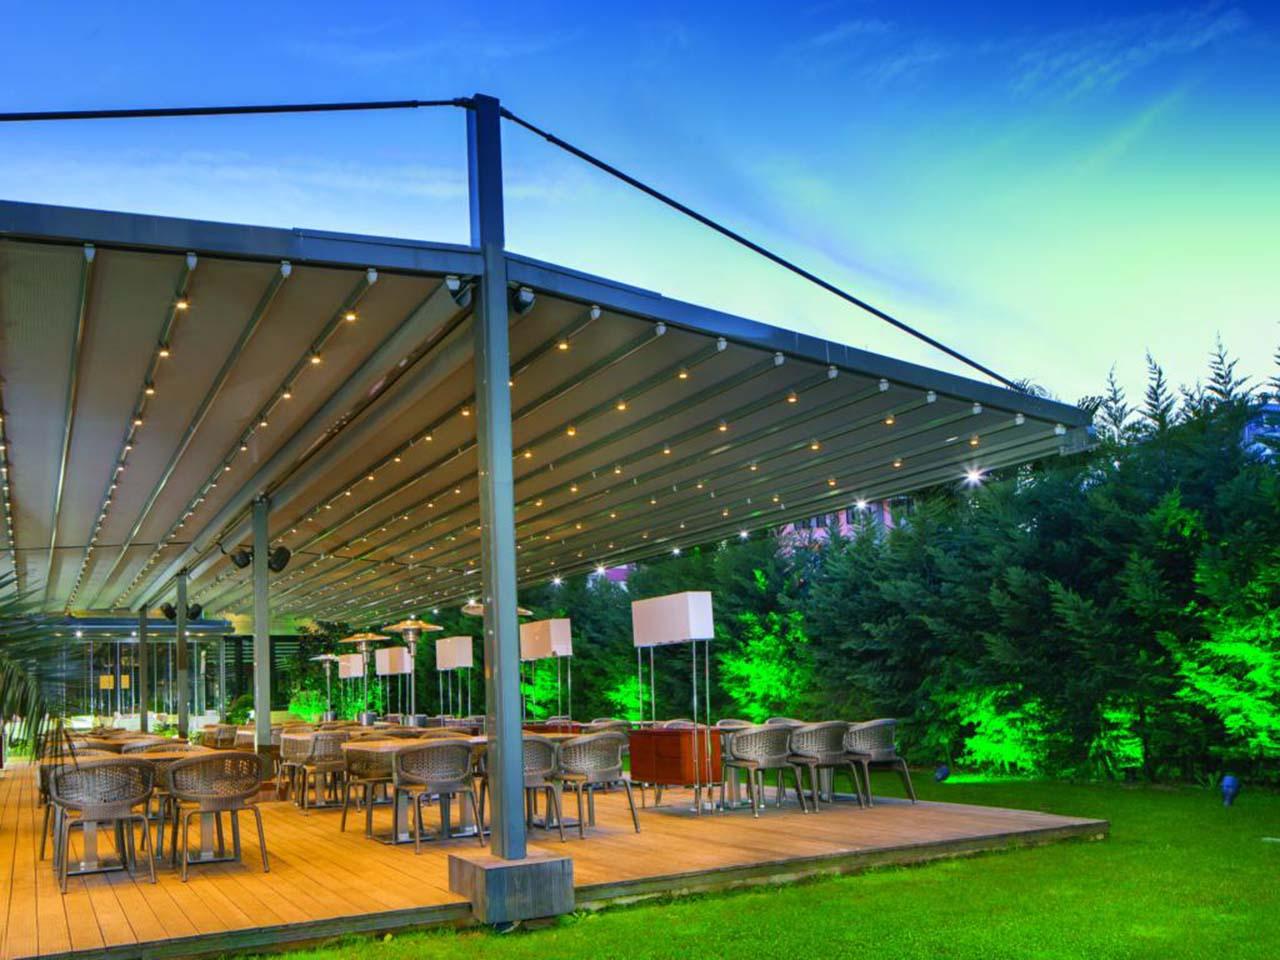 pergola marine palmiye terrassenueberdachung gastronomie biergaerten freiflaechen - Terrassenüberdachung für Biergärten & Freiflächen